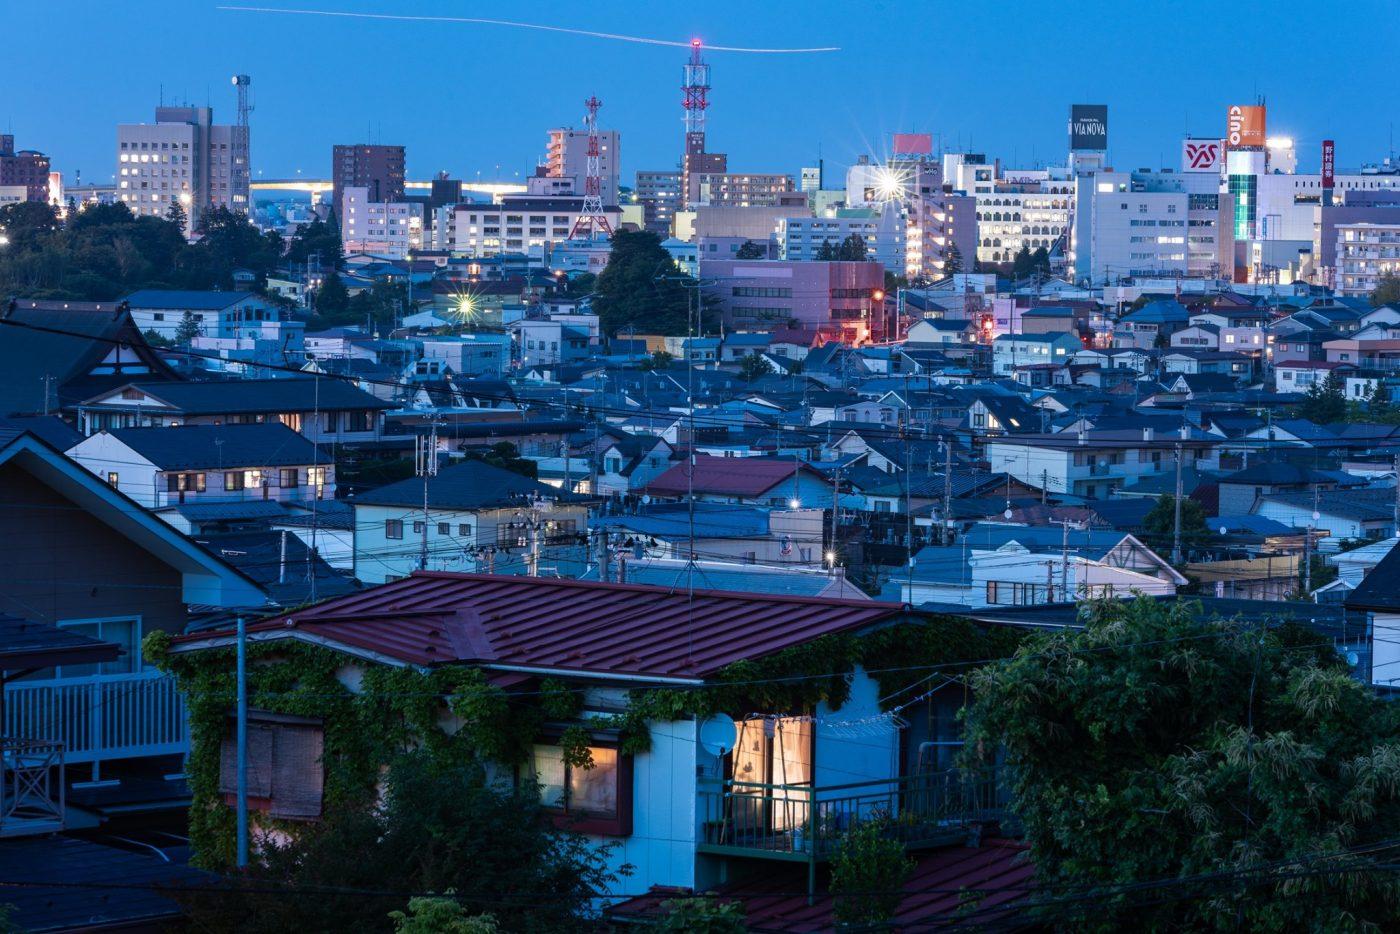 Venture For Japanで新卒採用の募集を開始しました!